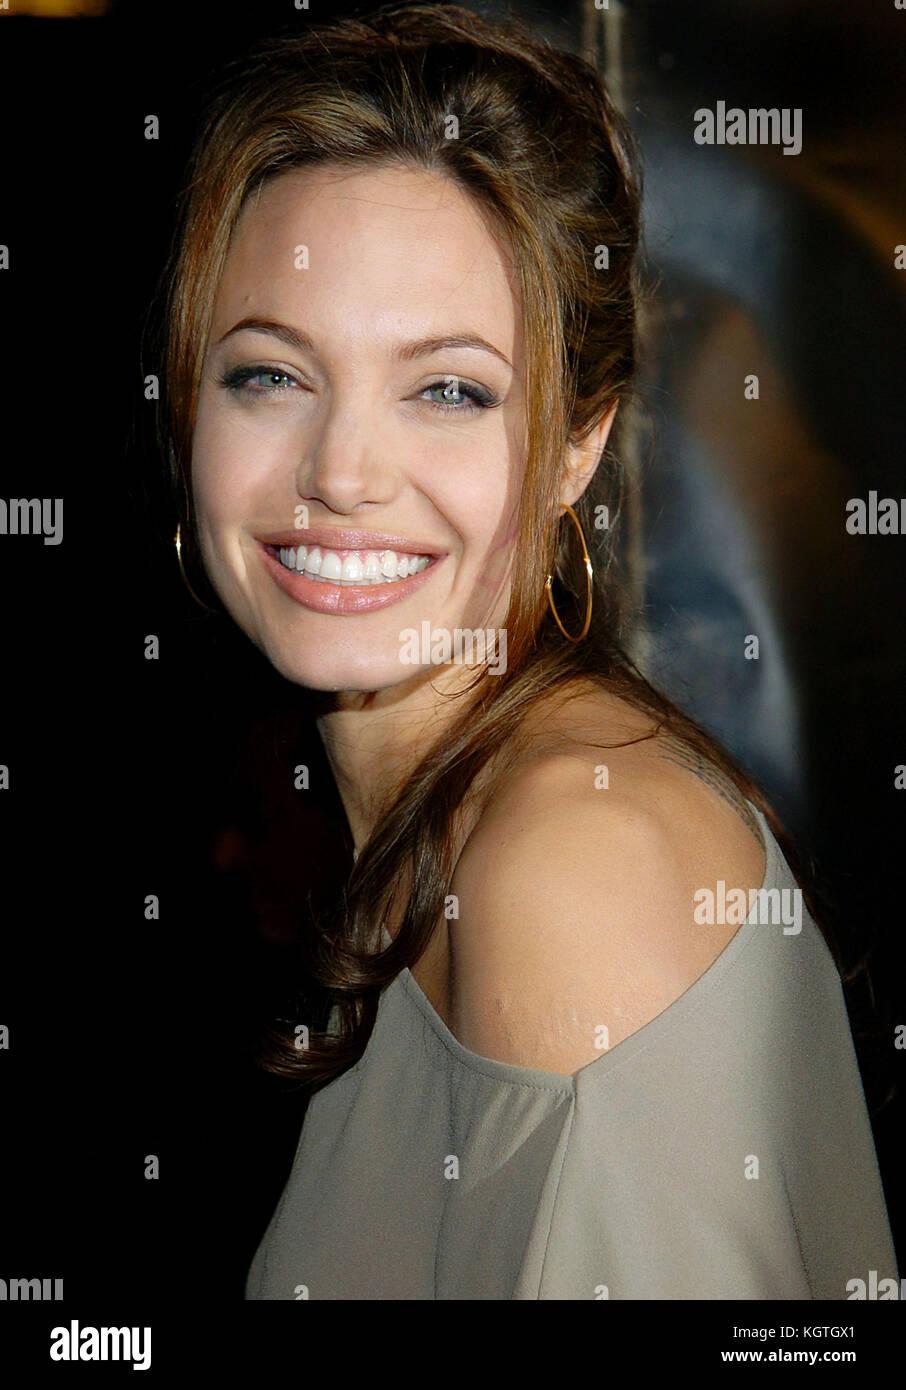 Angelina Jolie Taking Lives Film Stock Photos Angelina Jolie